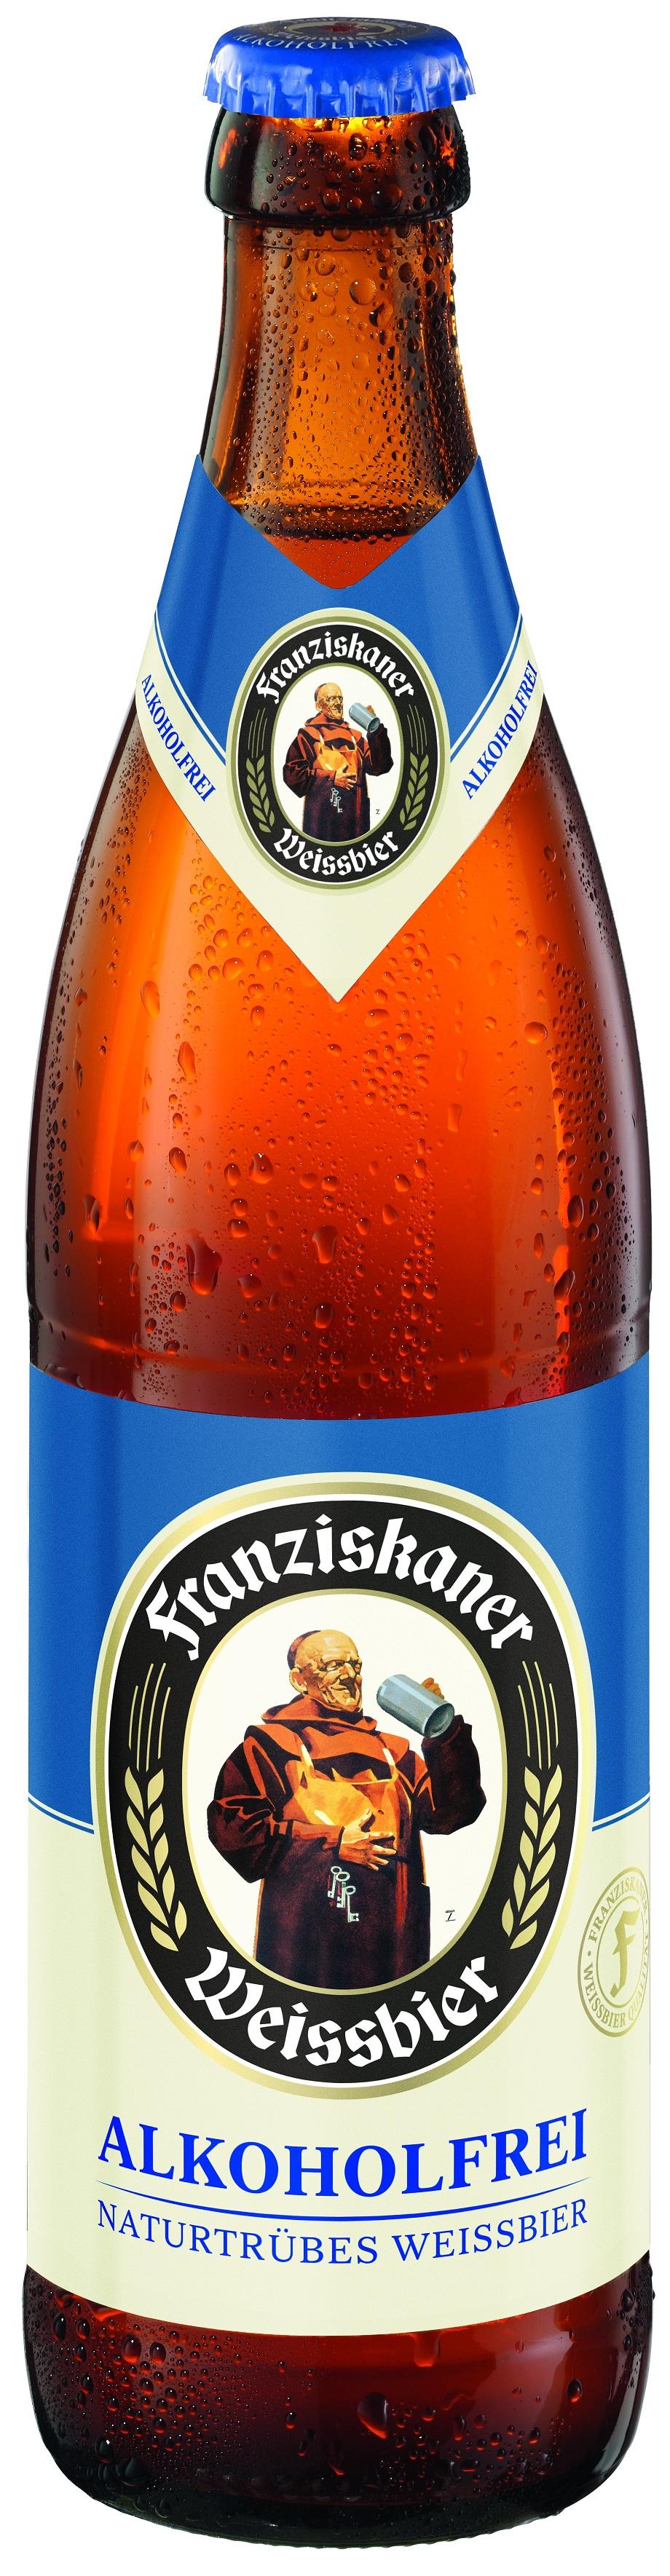 Franziskaner WeissbierAlkoholfrei